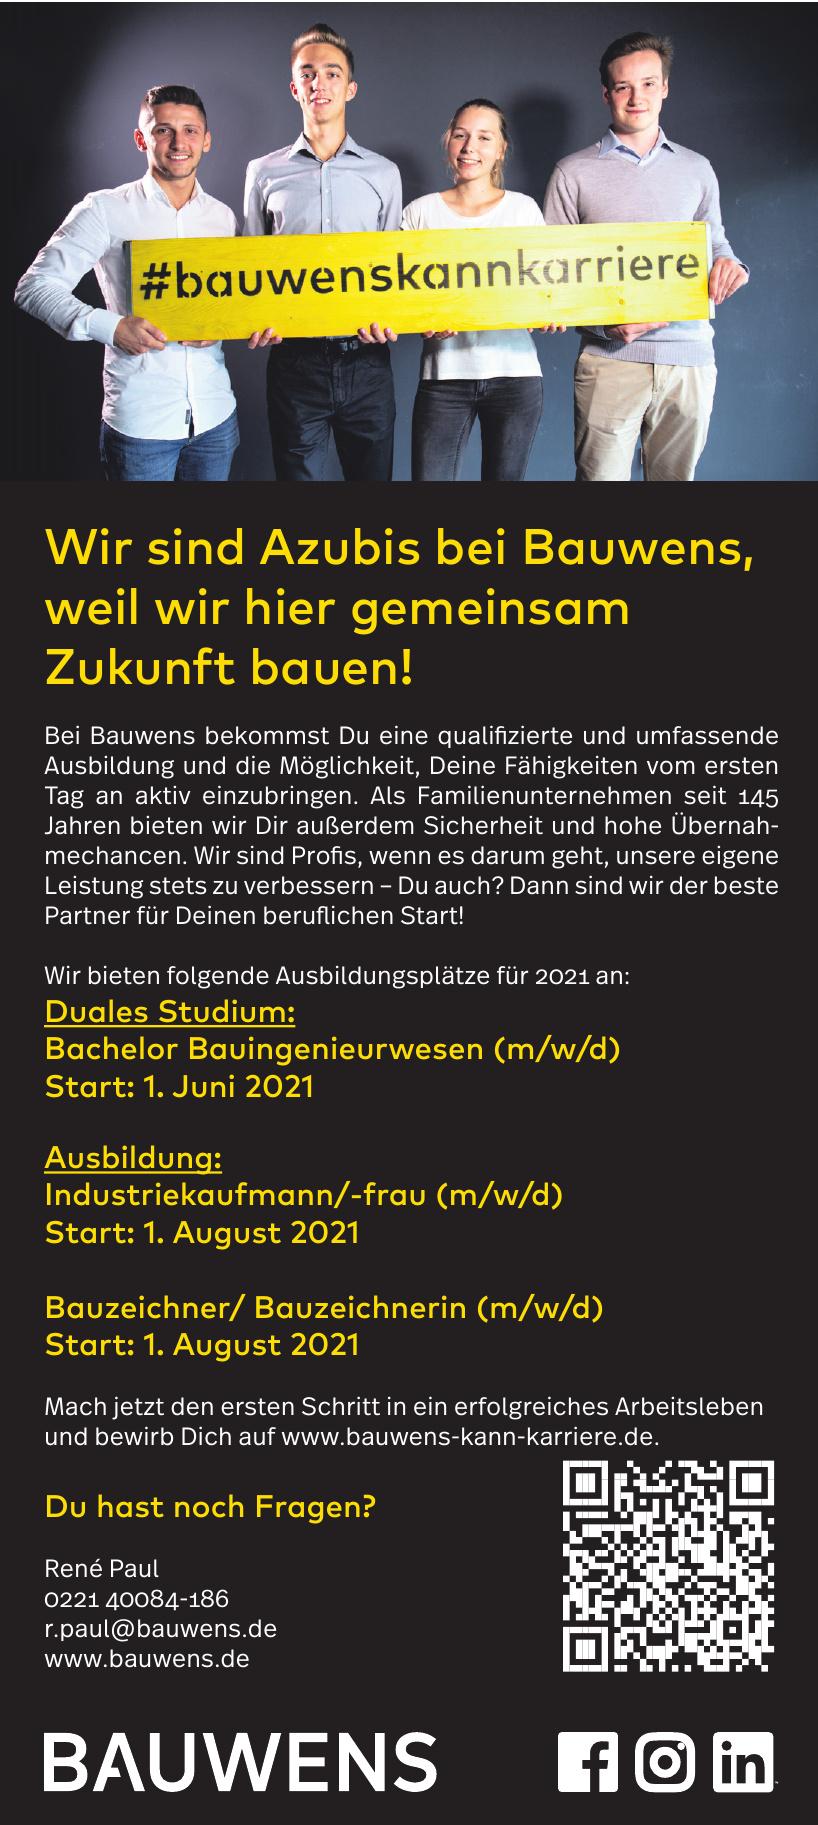 BAUWENS GmbH & Co. KG